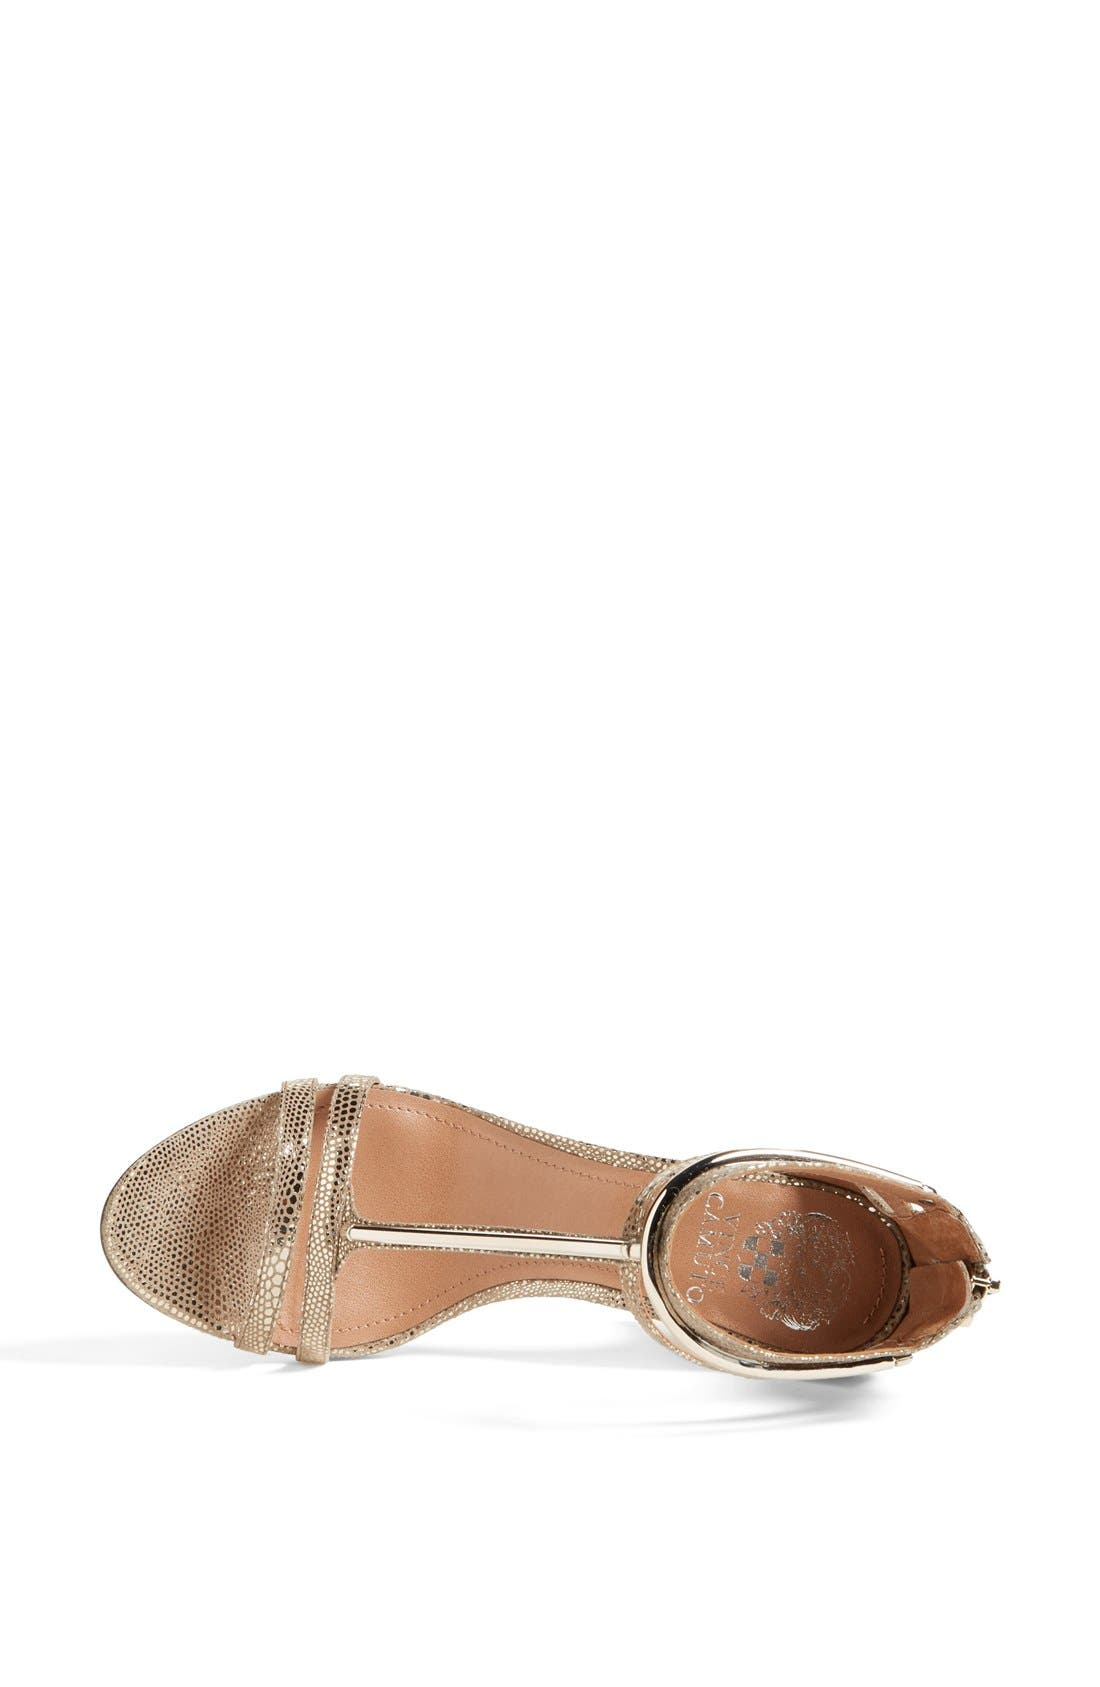 Alternate Image 3  - Vince Camuto 'Mitzy' Metallic T-Strap Sandal (Women)